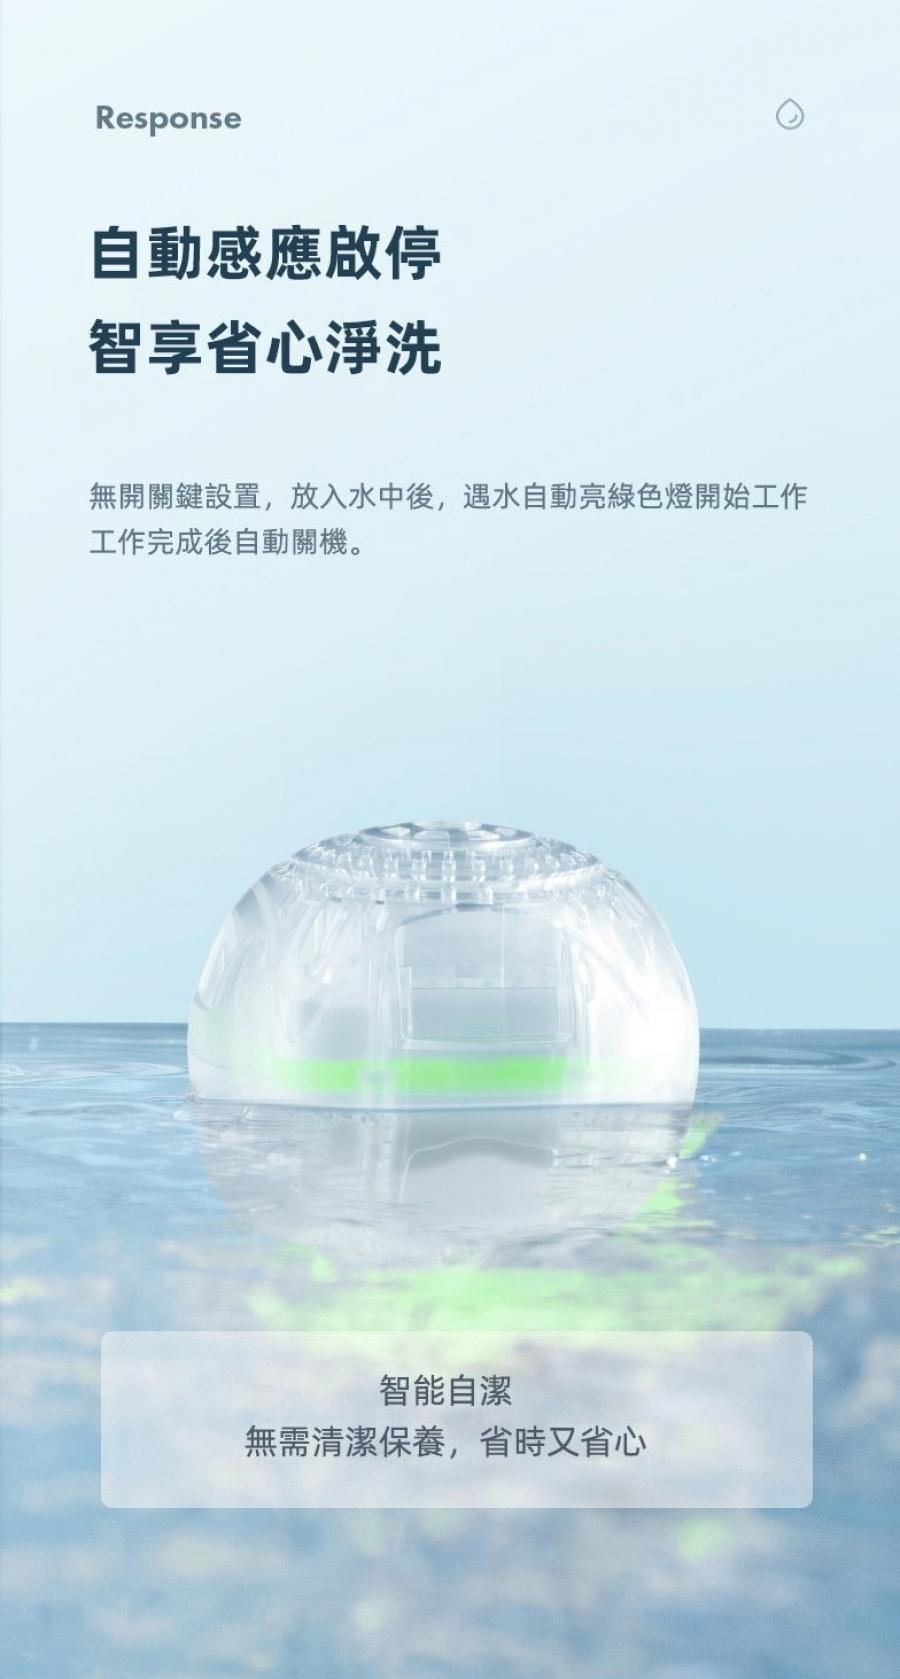 Washwow 5.0 微型便攜電解洗衣球